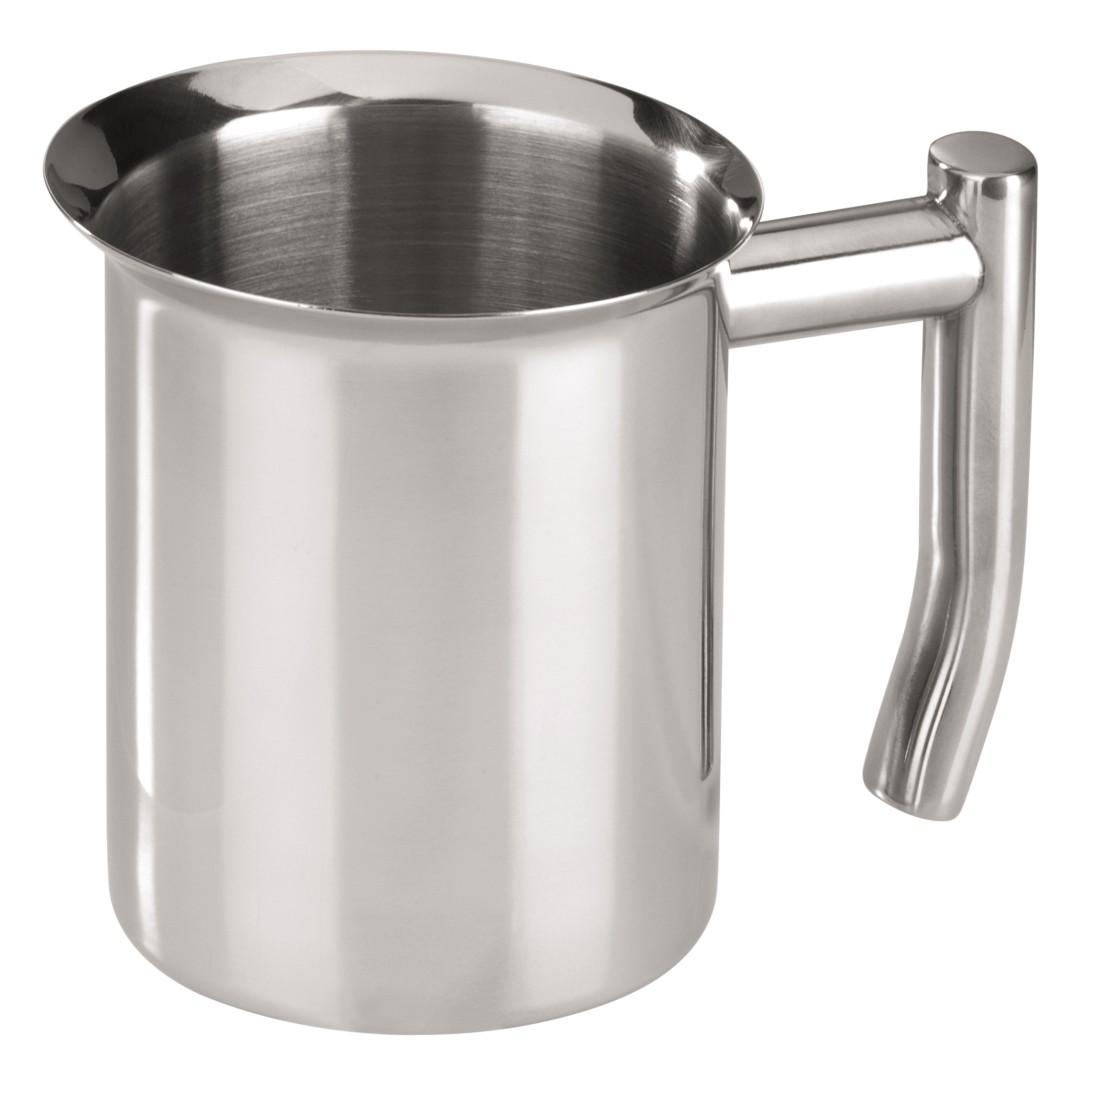 Xavax Eu 00111166 Xavax Milk Jug Stainless Steel